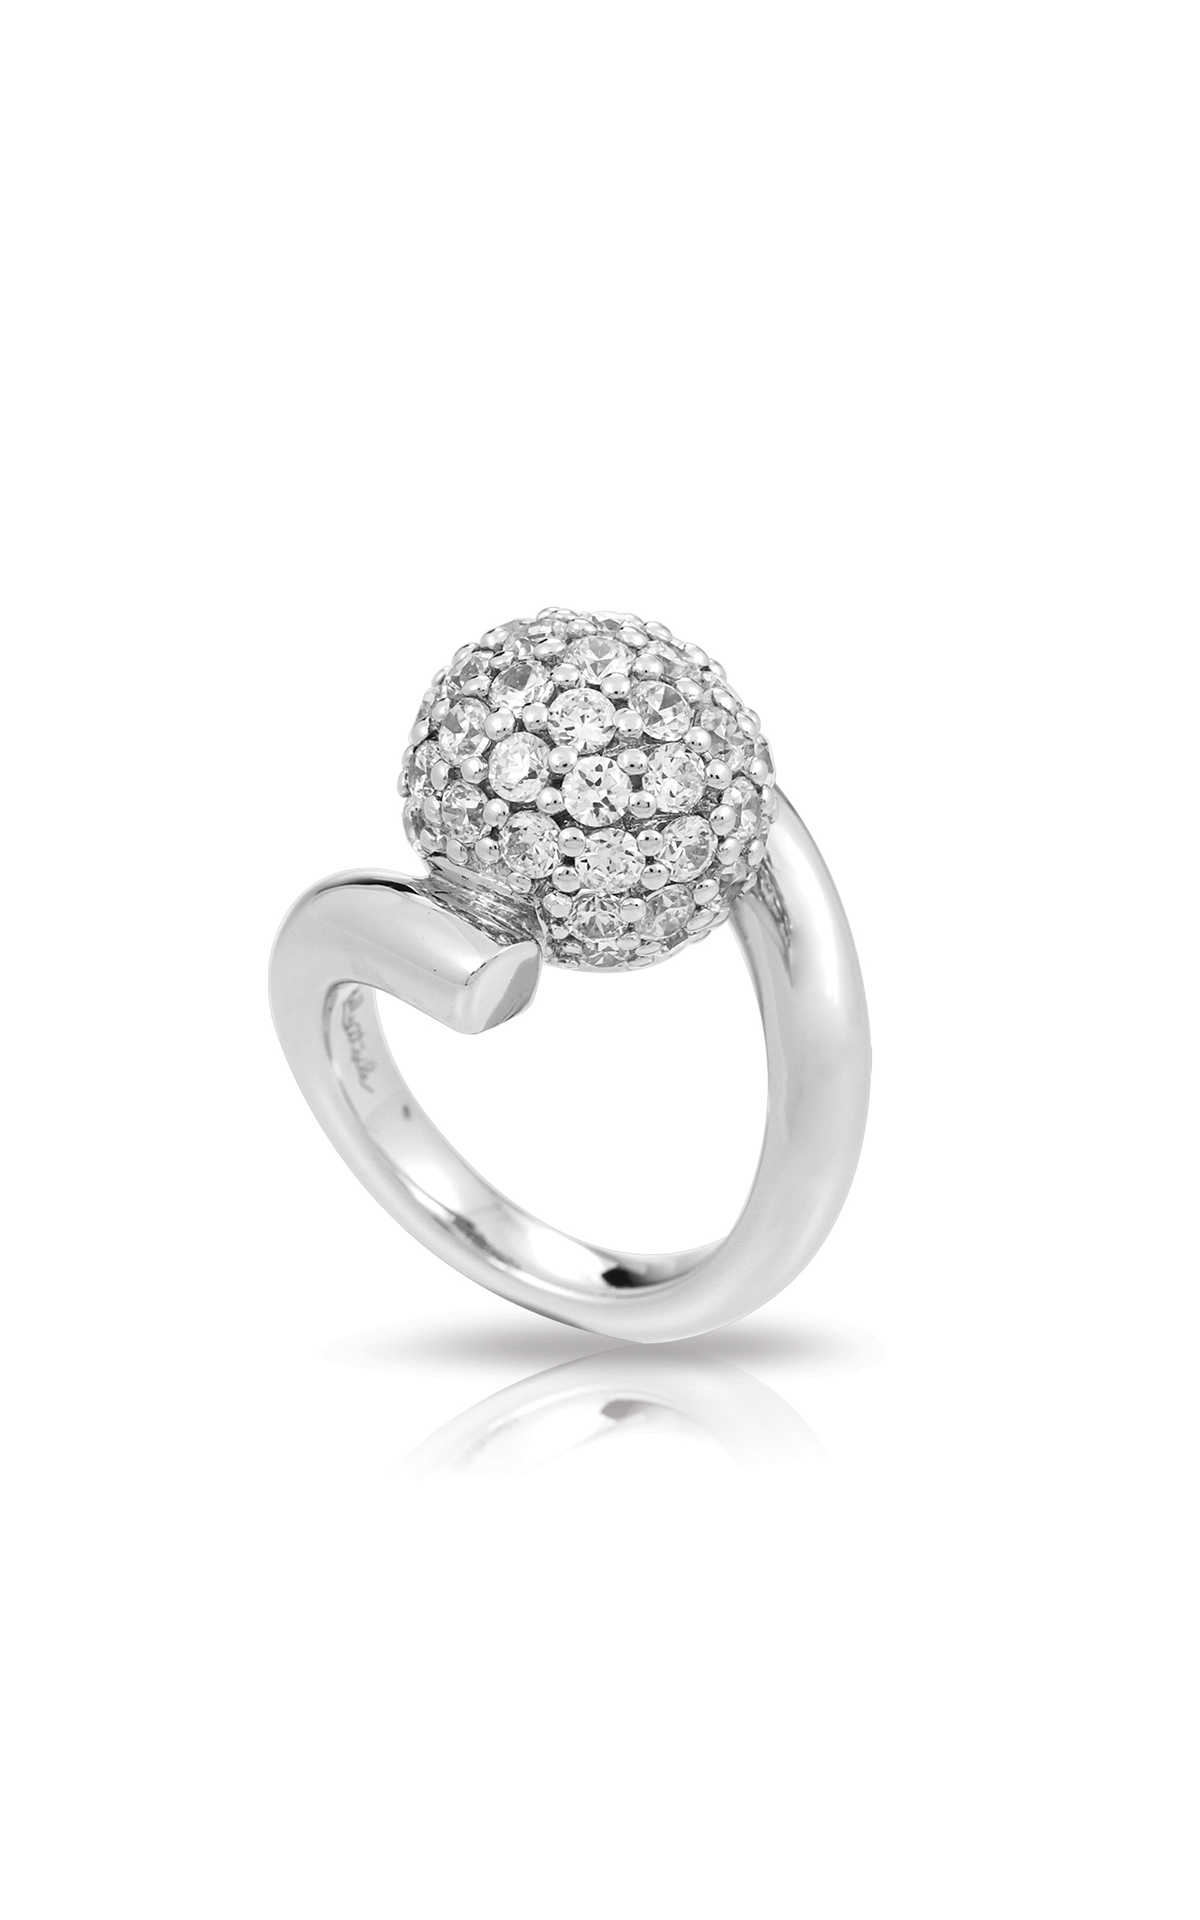 Belle Etoile Pop White Ring 01010810203-9 product image